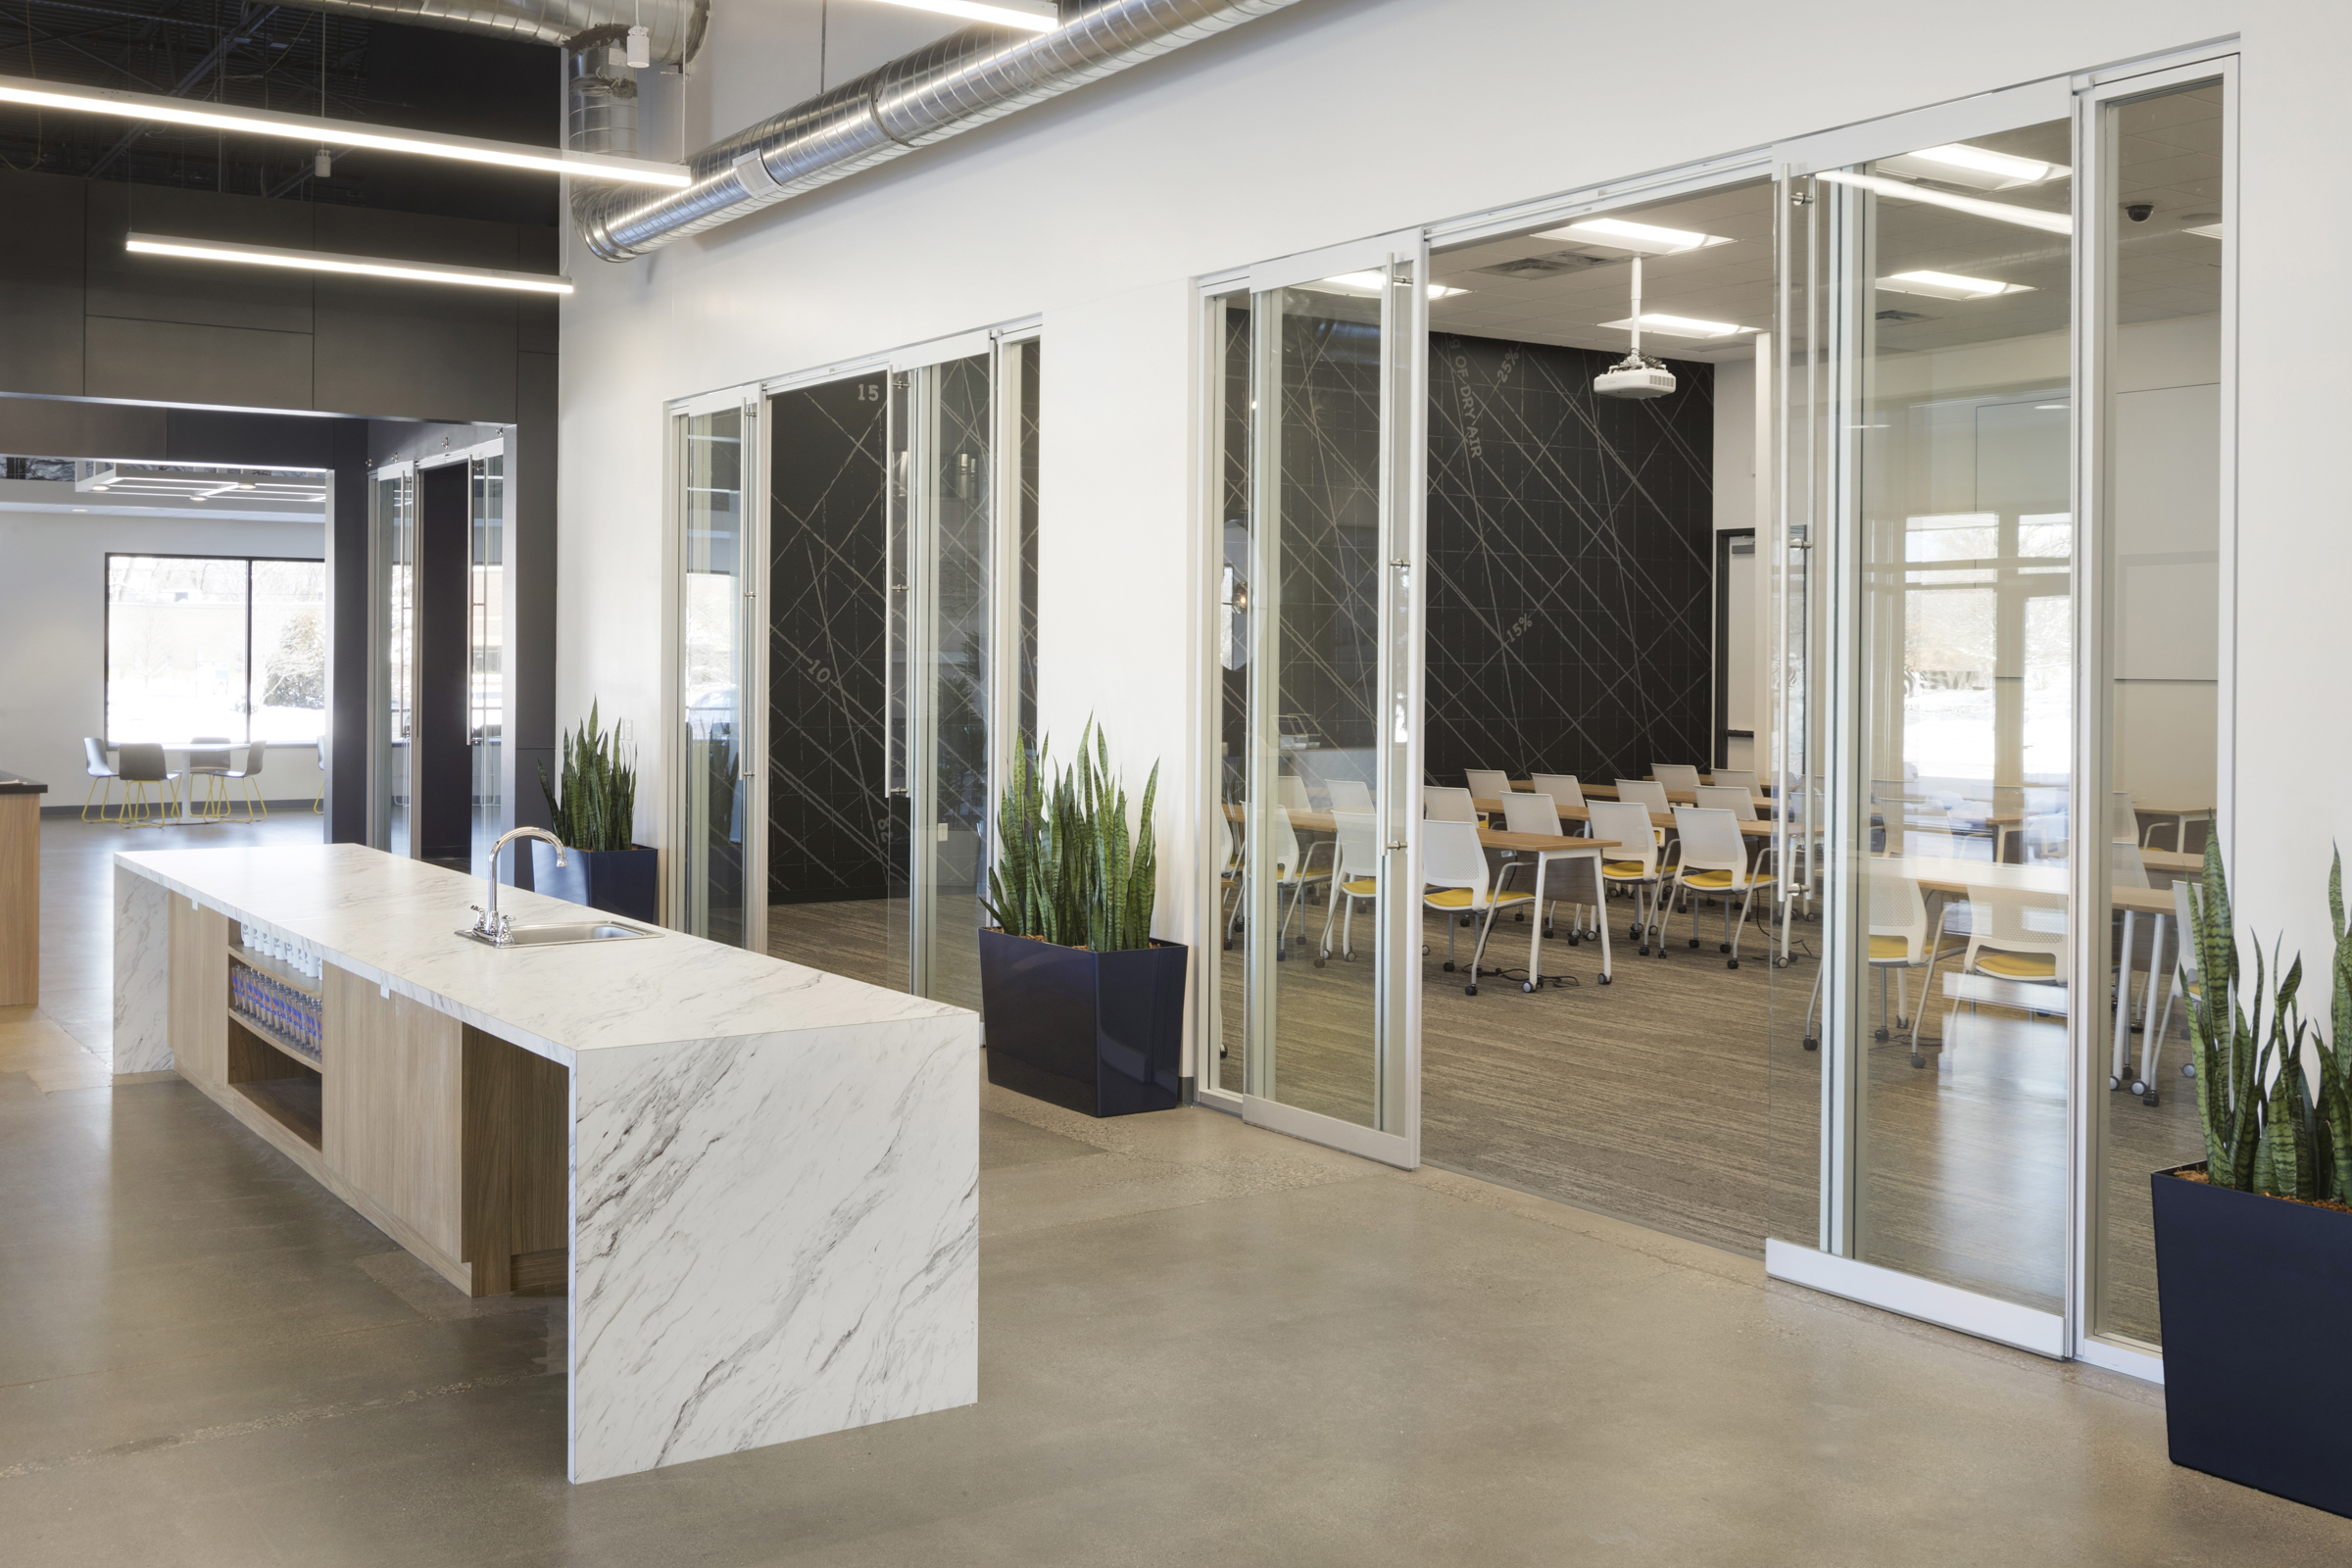 Workplace Entry Design | Vela Creative Interior Design